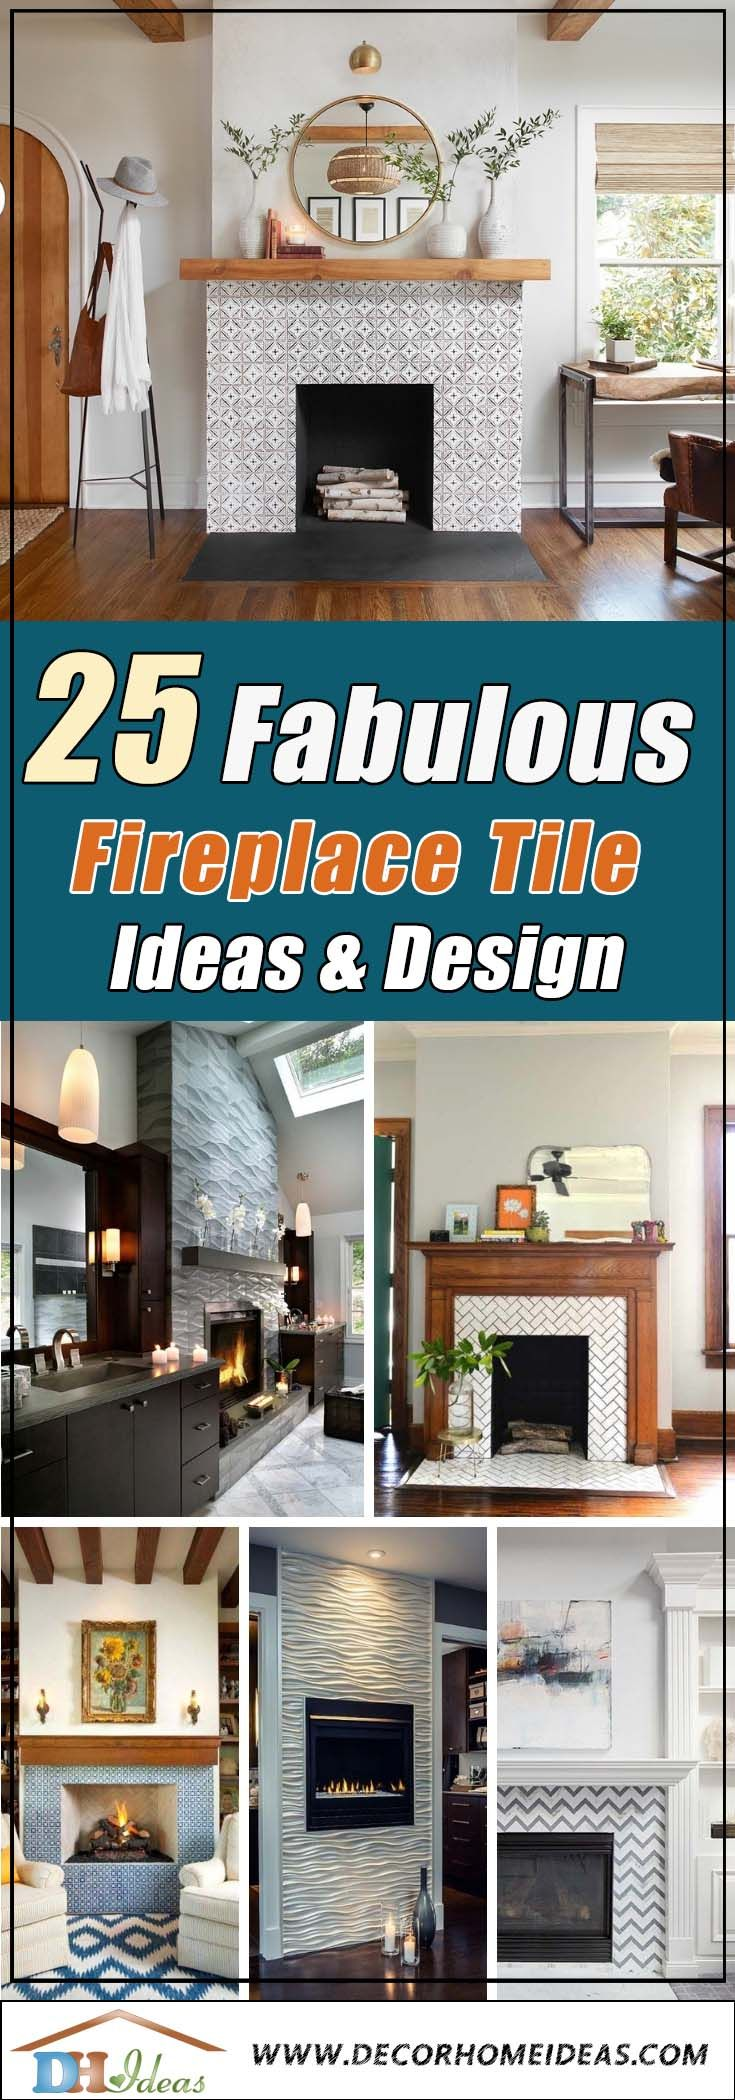 26 amazing fireplace tile ideas